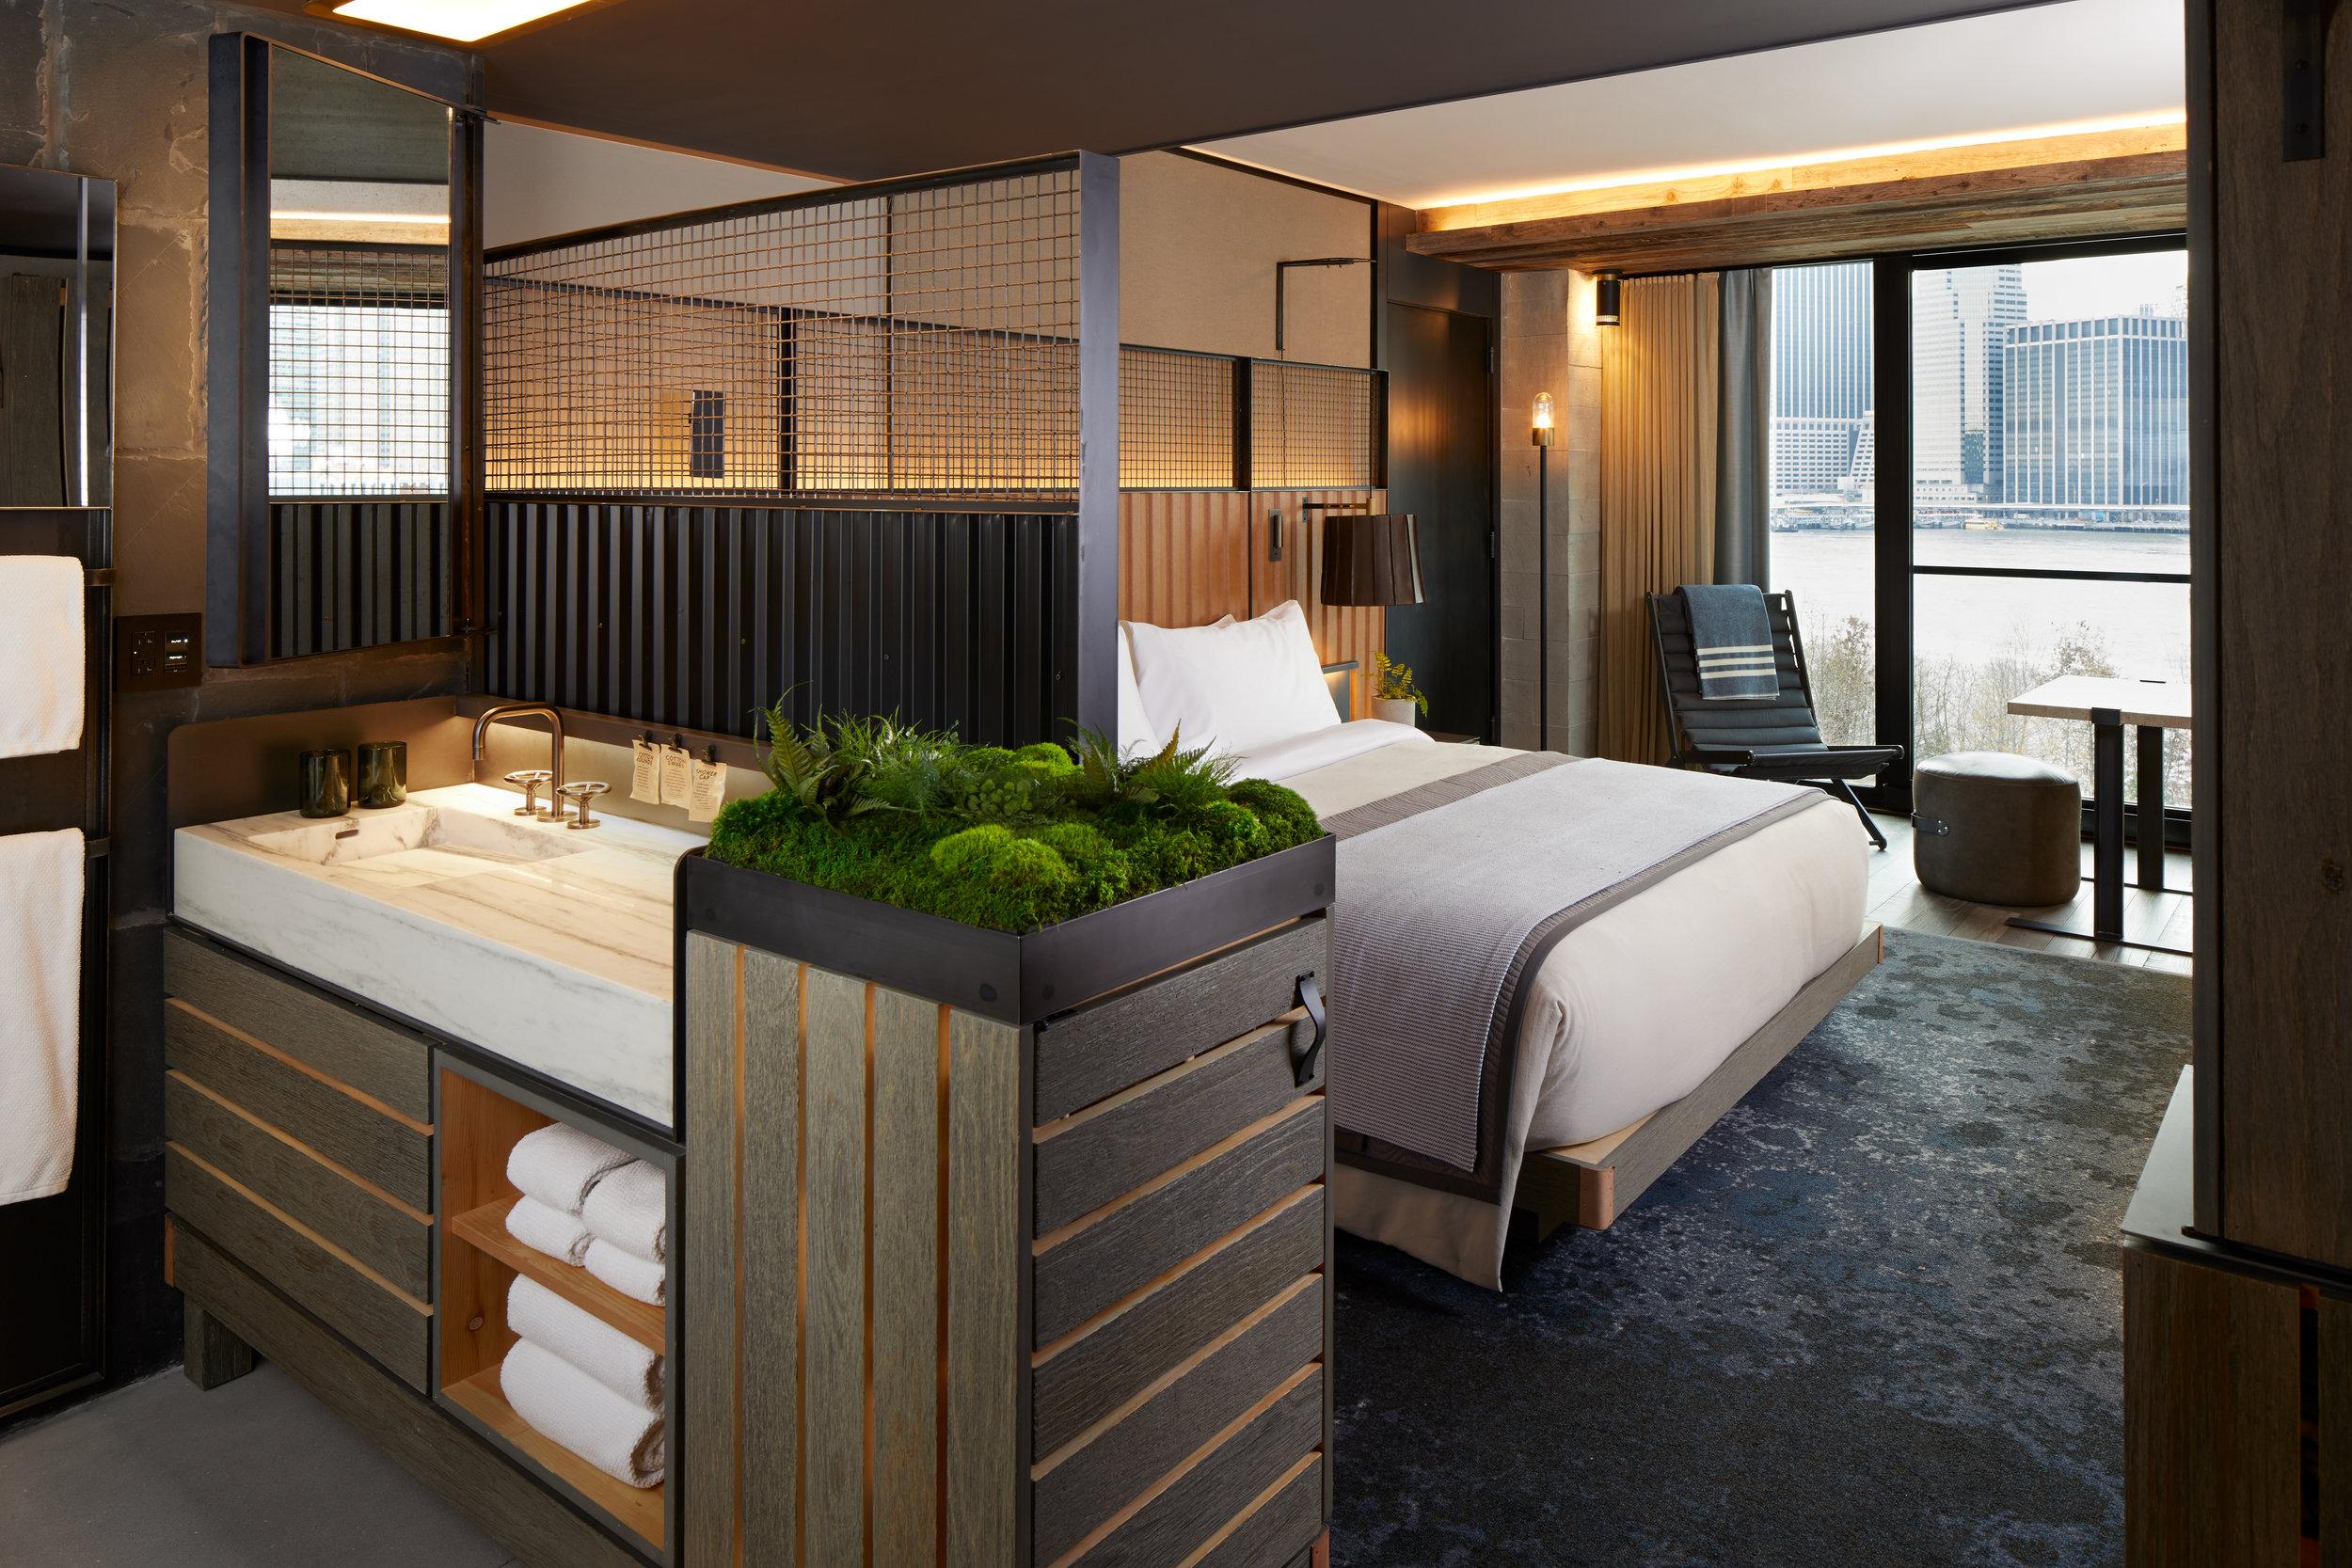 1_Hotel_Brooklyn_Bridge_Skyline_King_HI.jpg